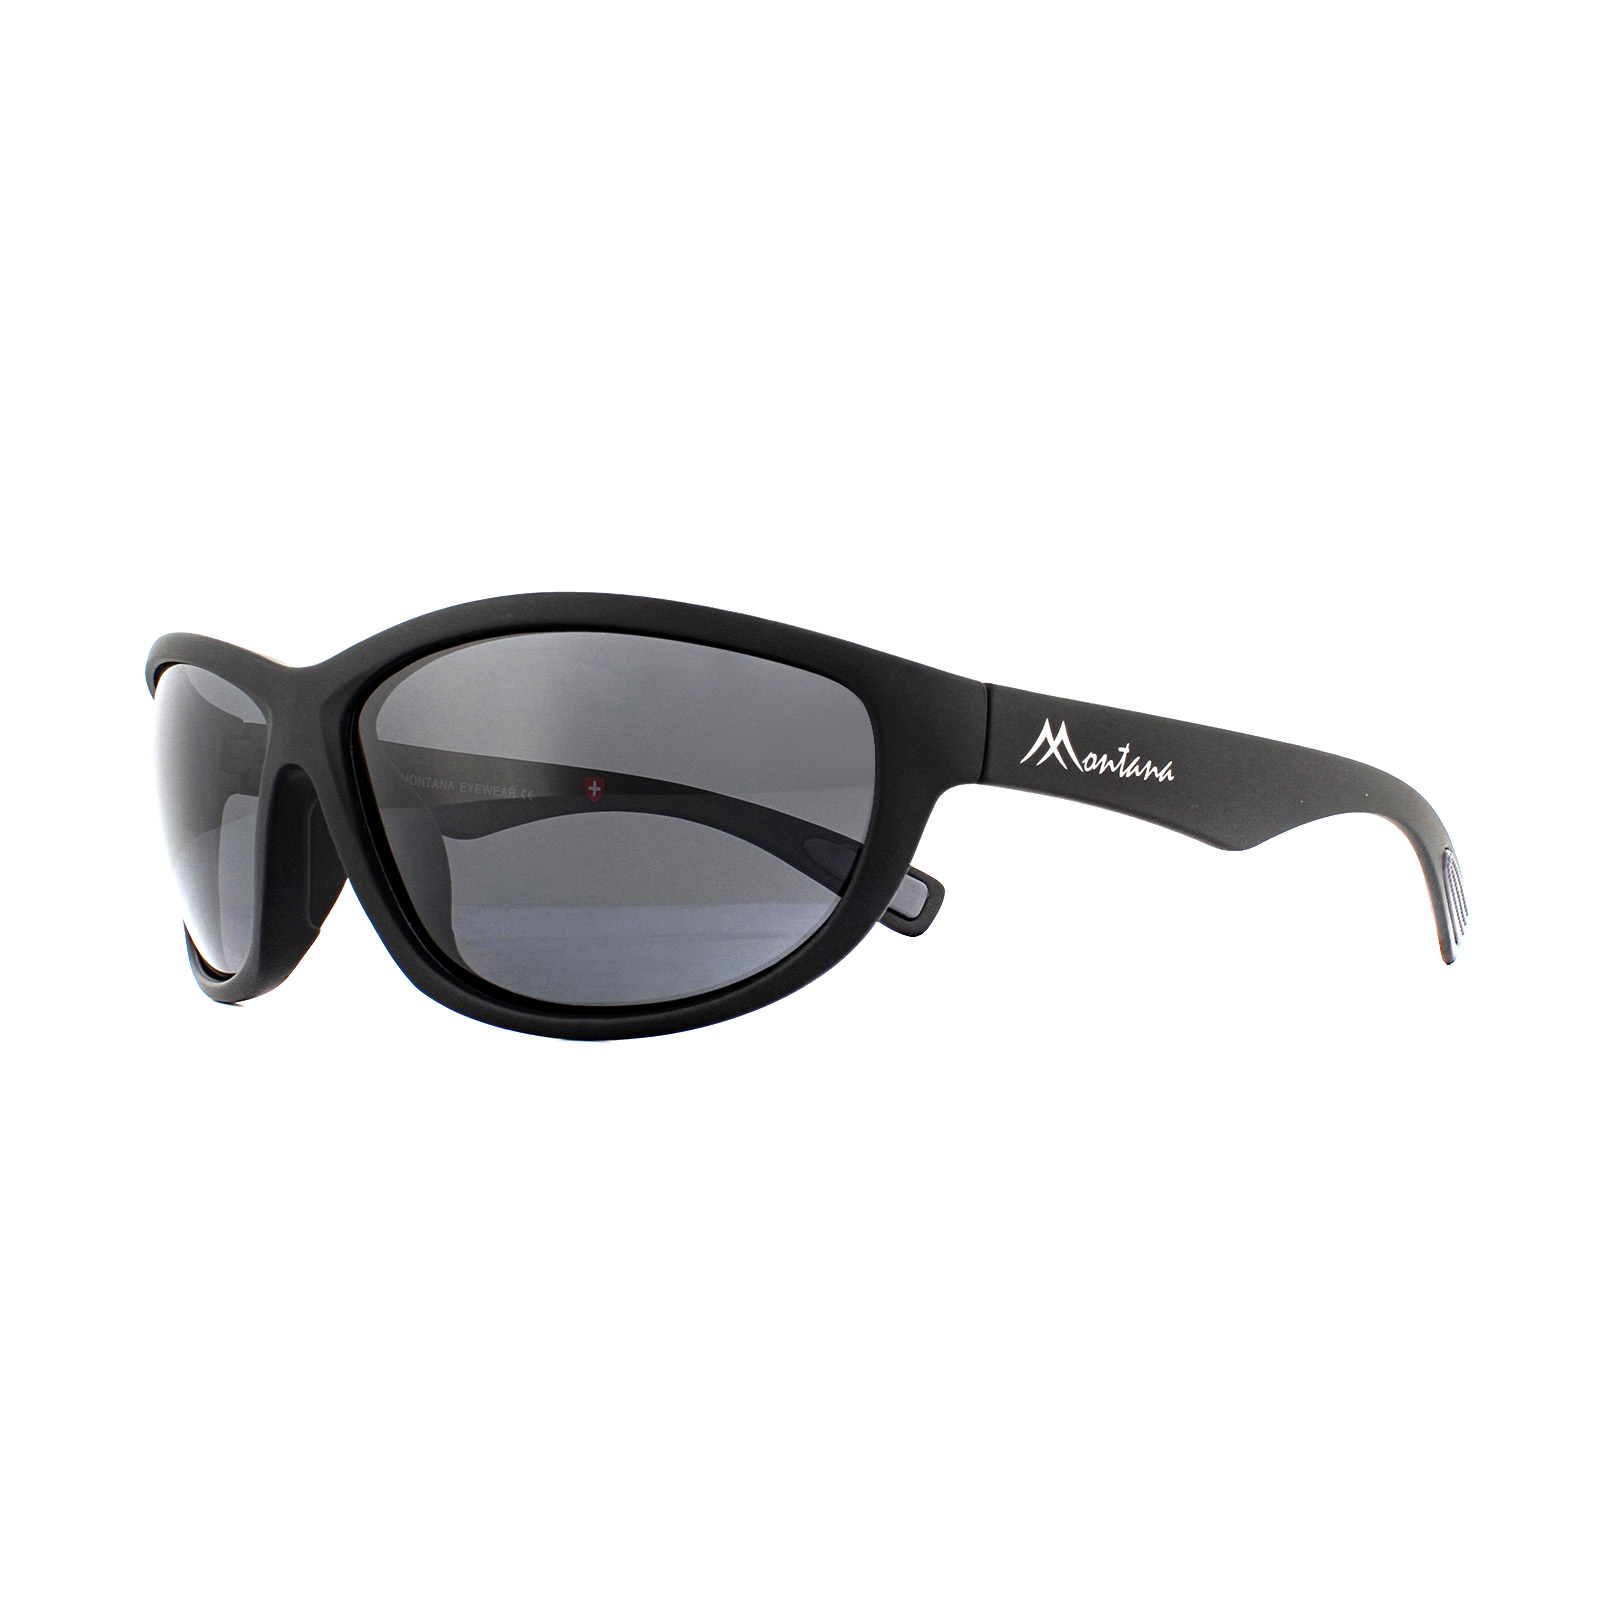 Gafas de sol MOSCA NEGRA modelo ALPHA SUNSET GREEN Polarized Sunglasses Unisex